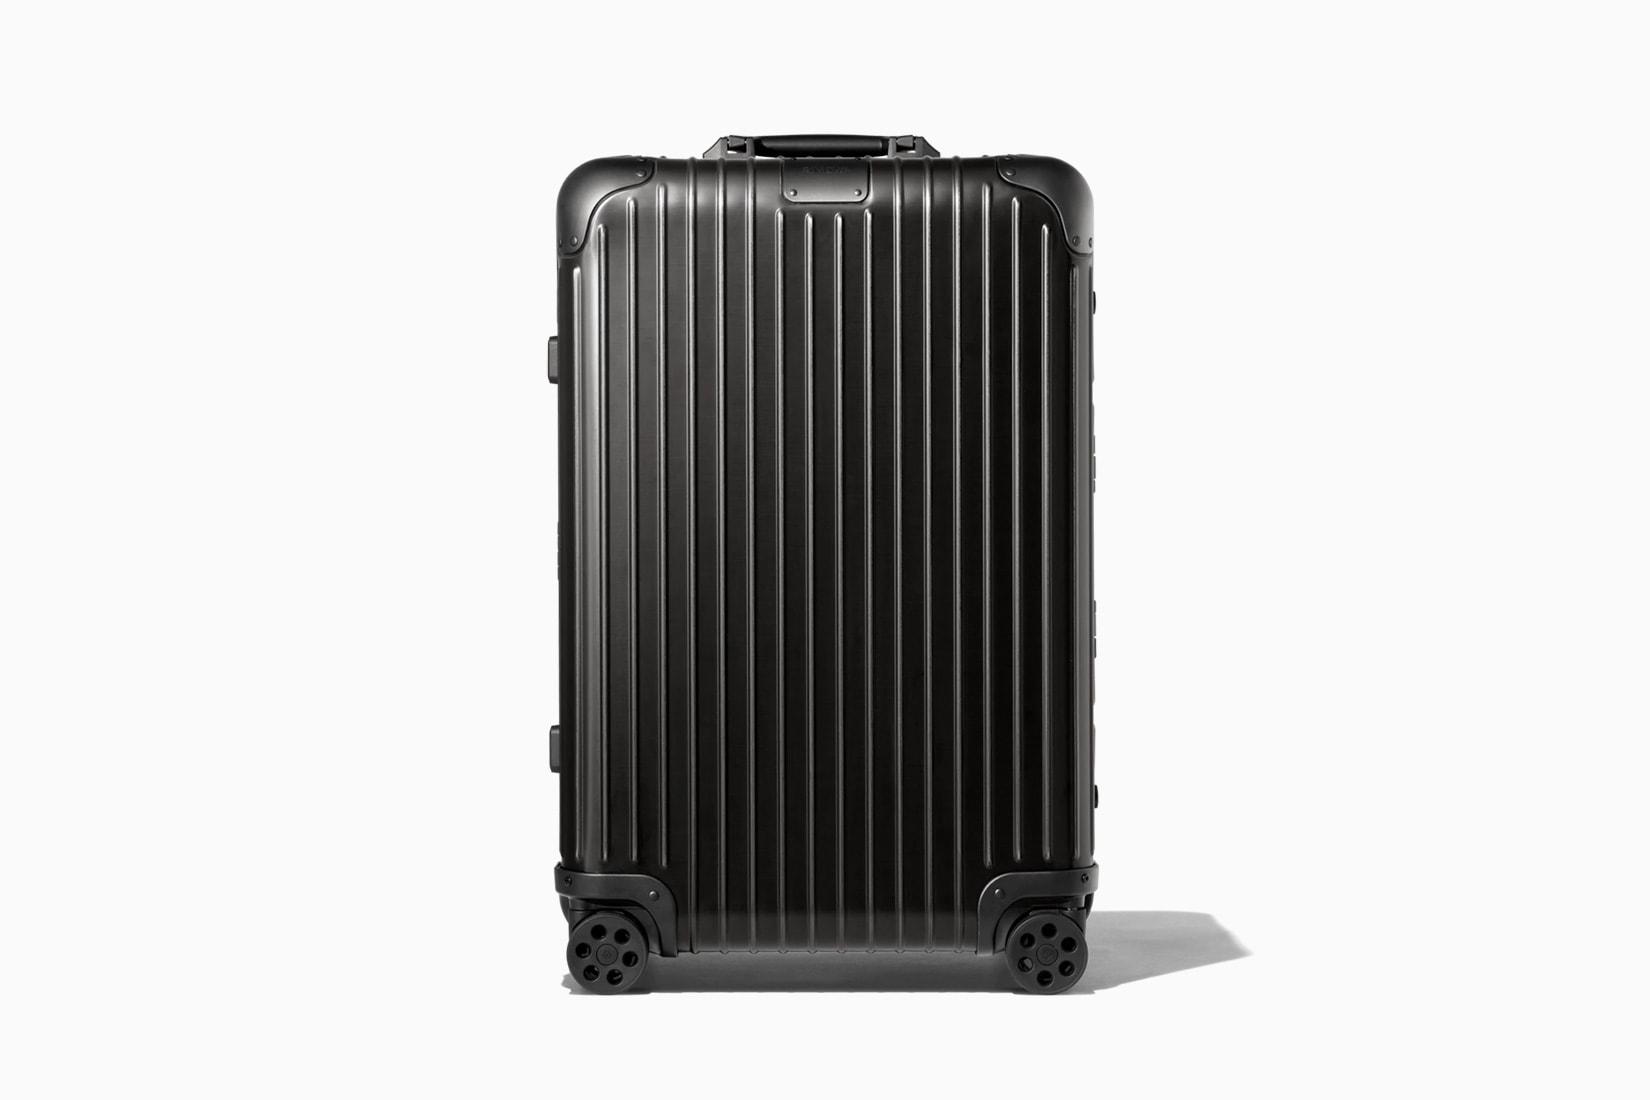 best luggage brands high end rimowa original - Luxe Digital